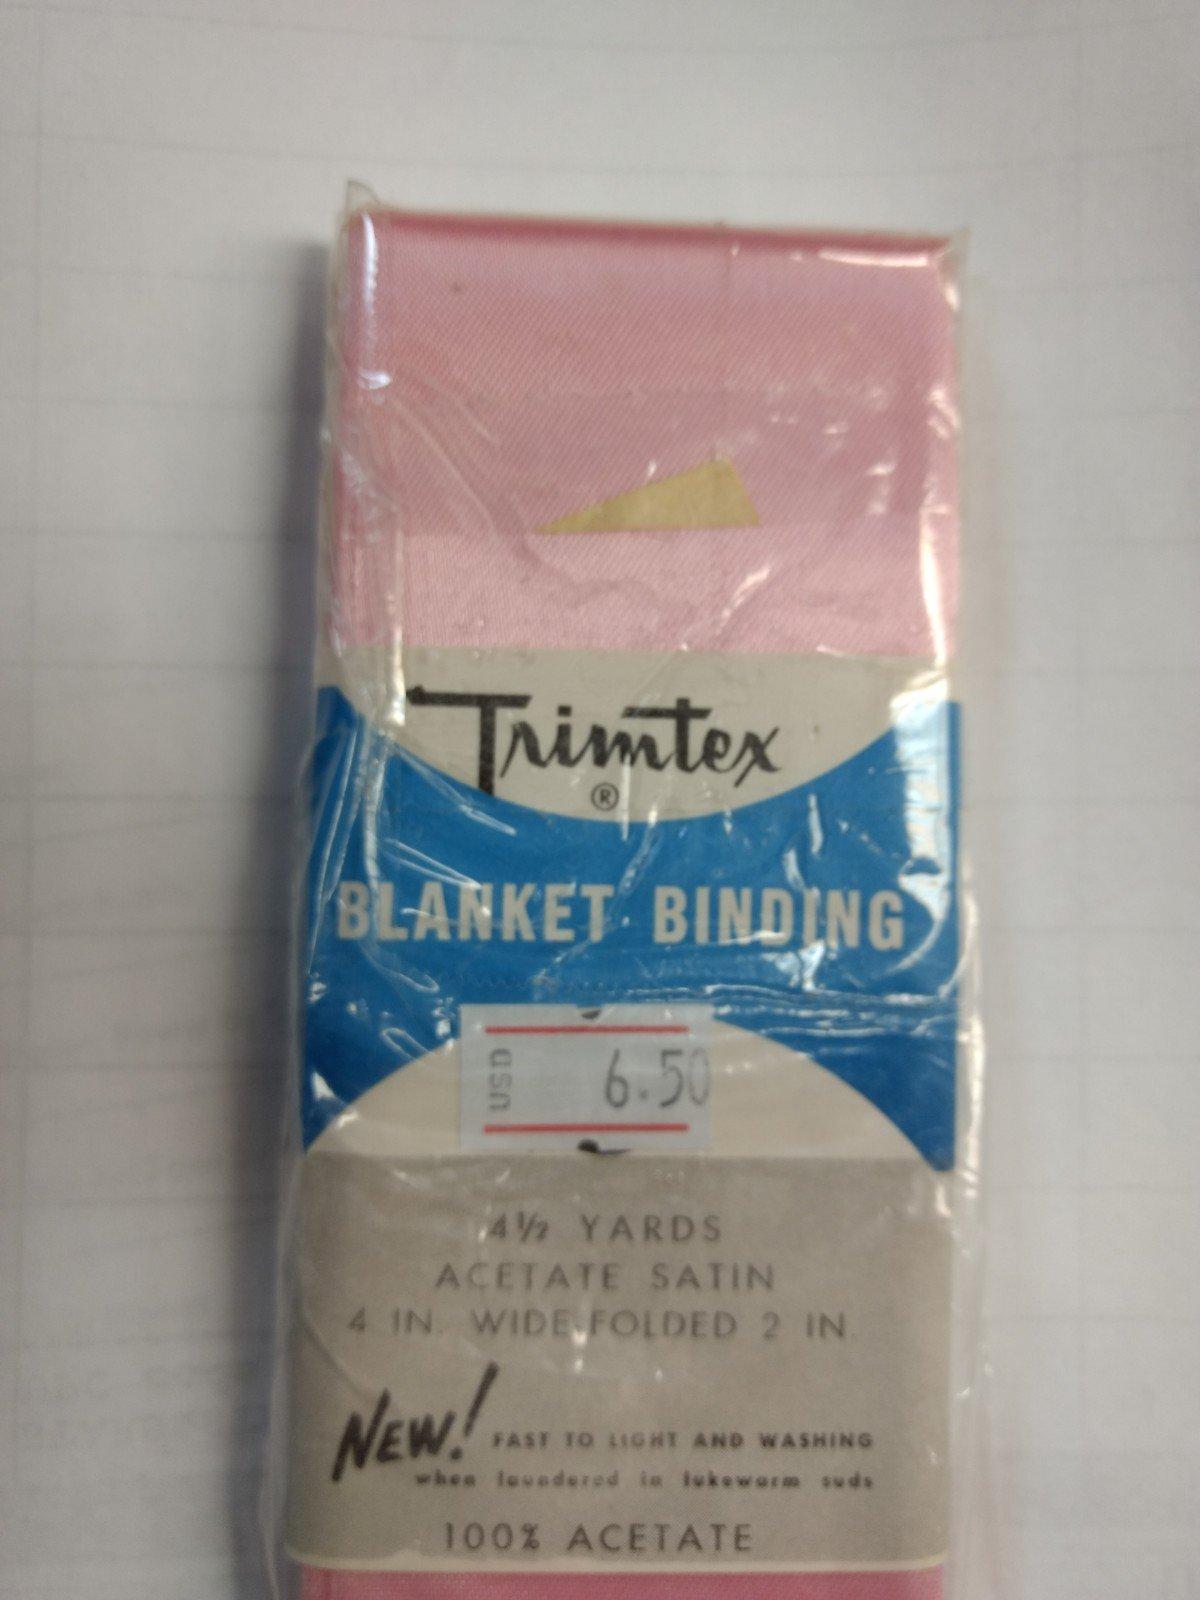 Blanket Binding Satin 2 inch 4 1/2 yards Quartz Pink #876 Trimtex